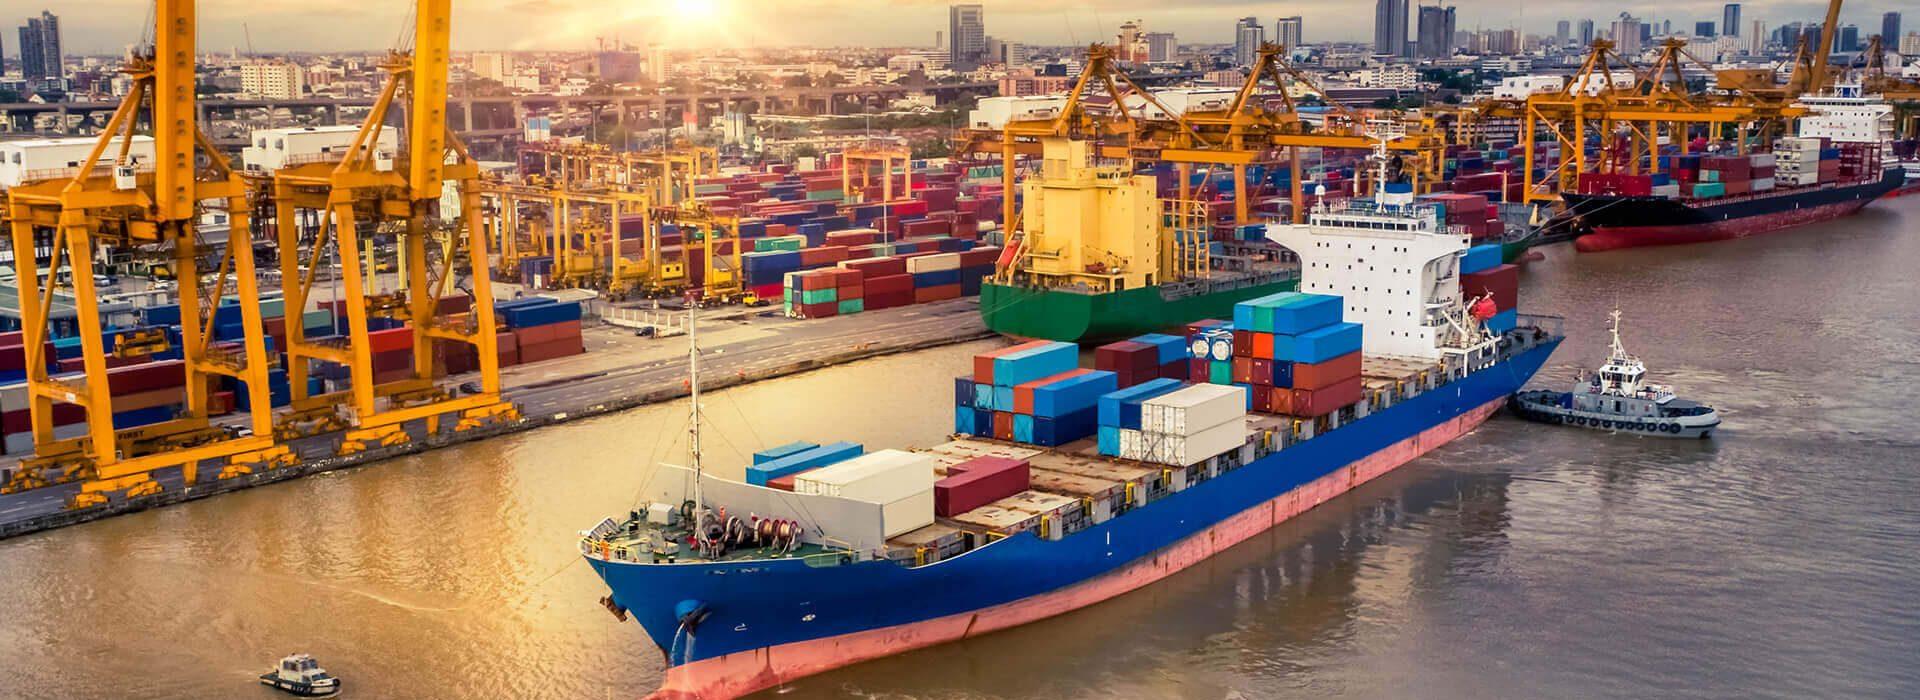 Ocean Freight - Blitz Logistics